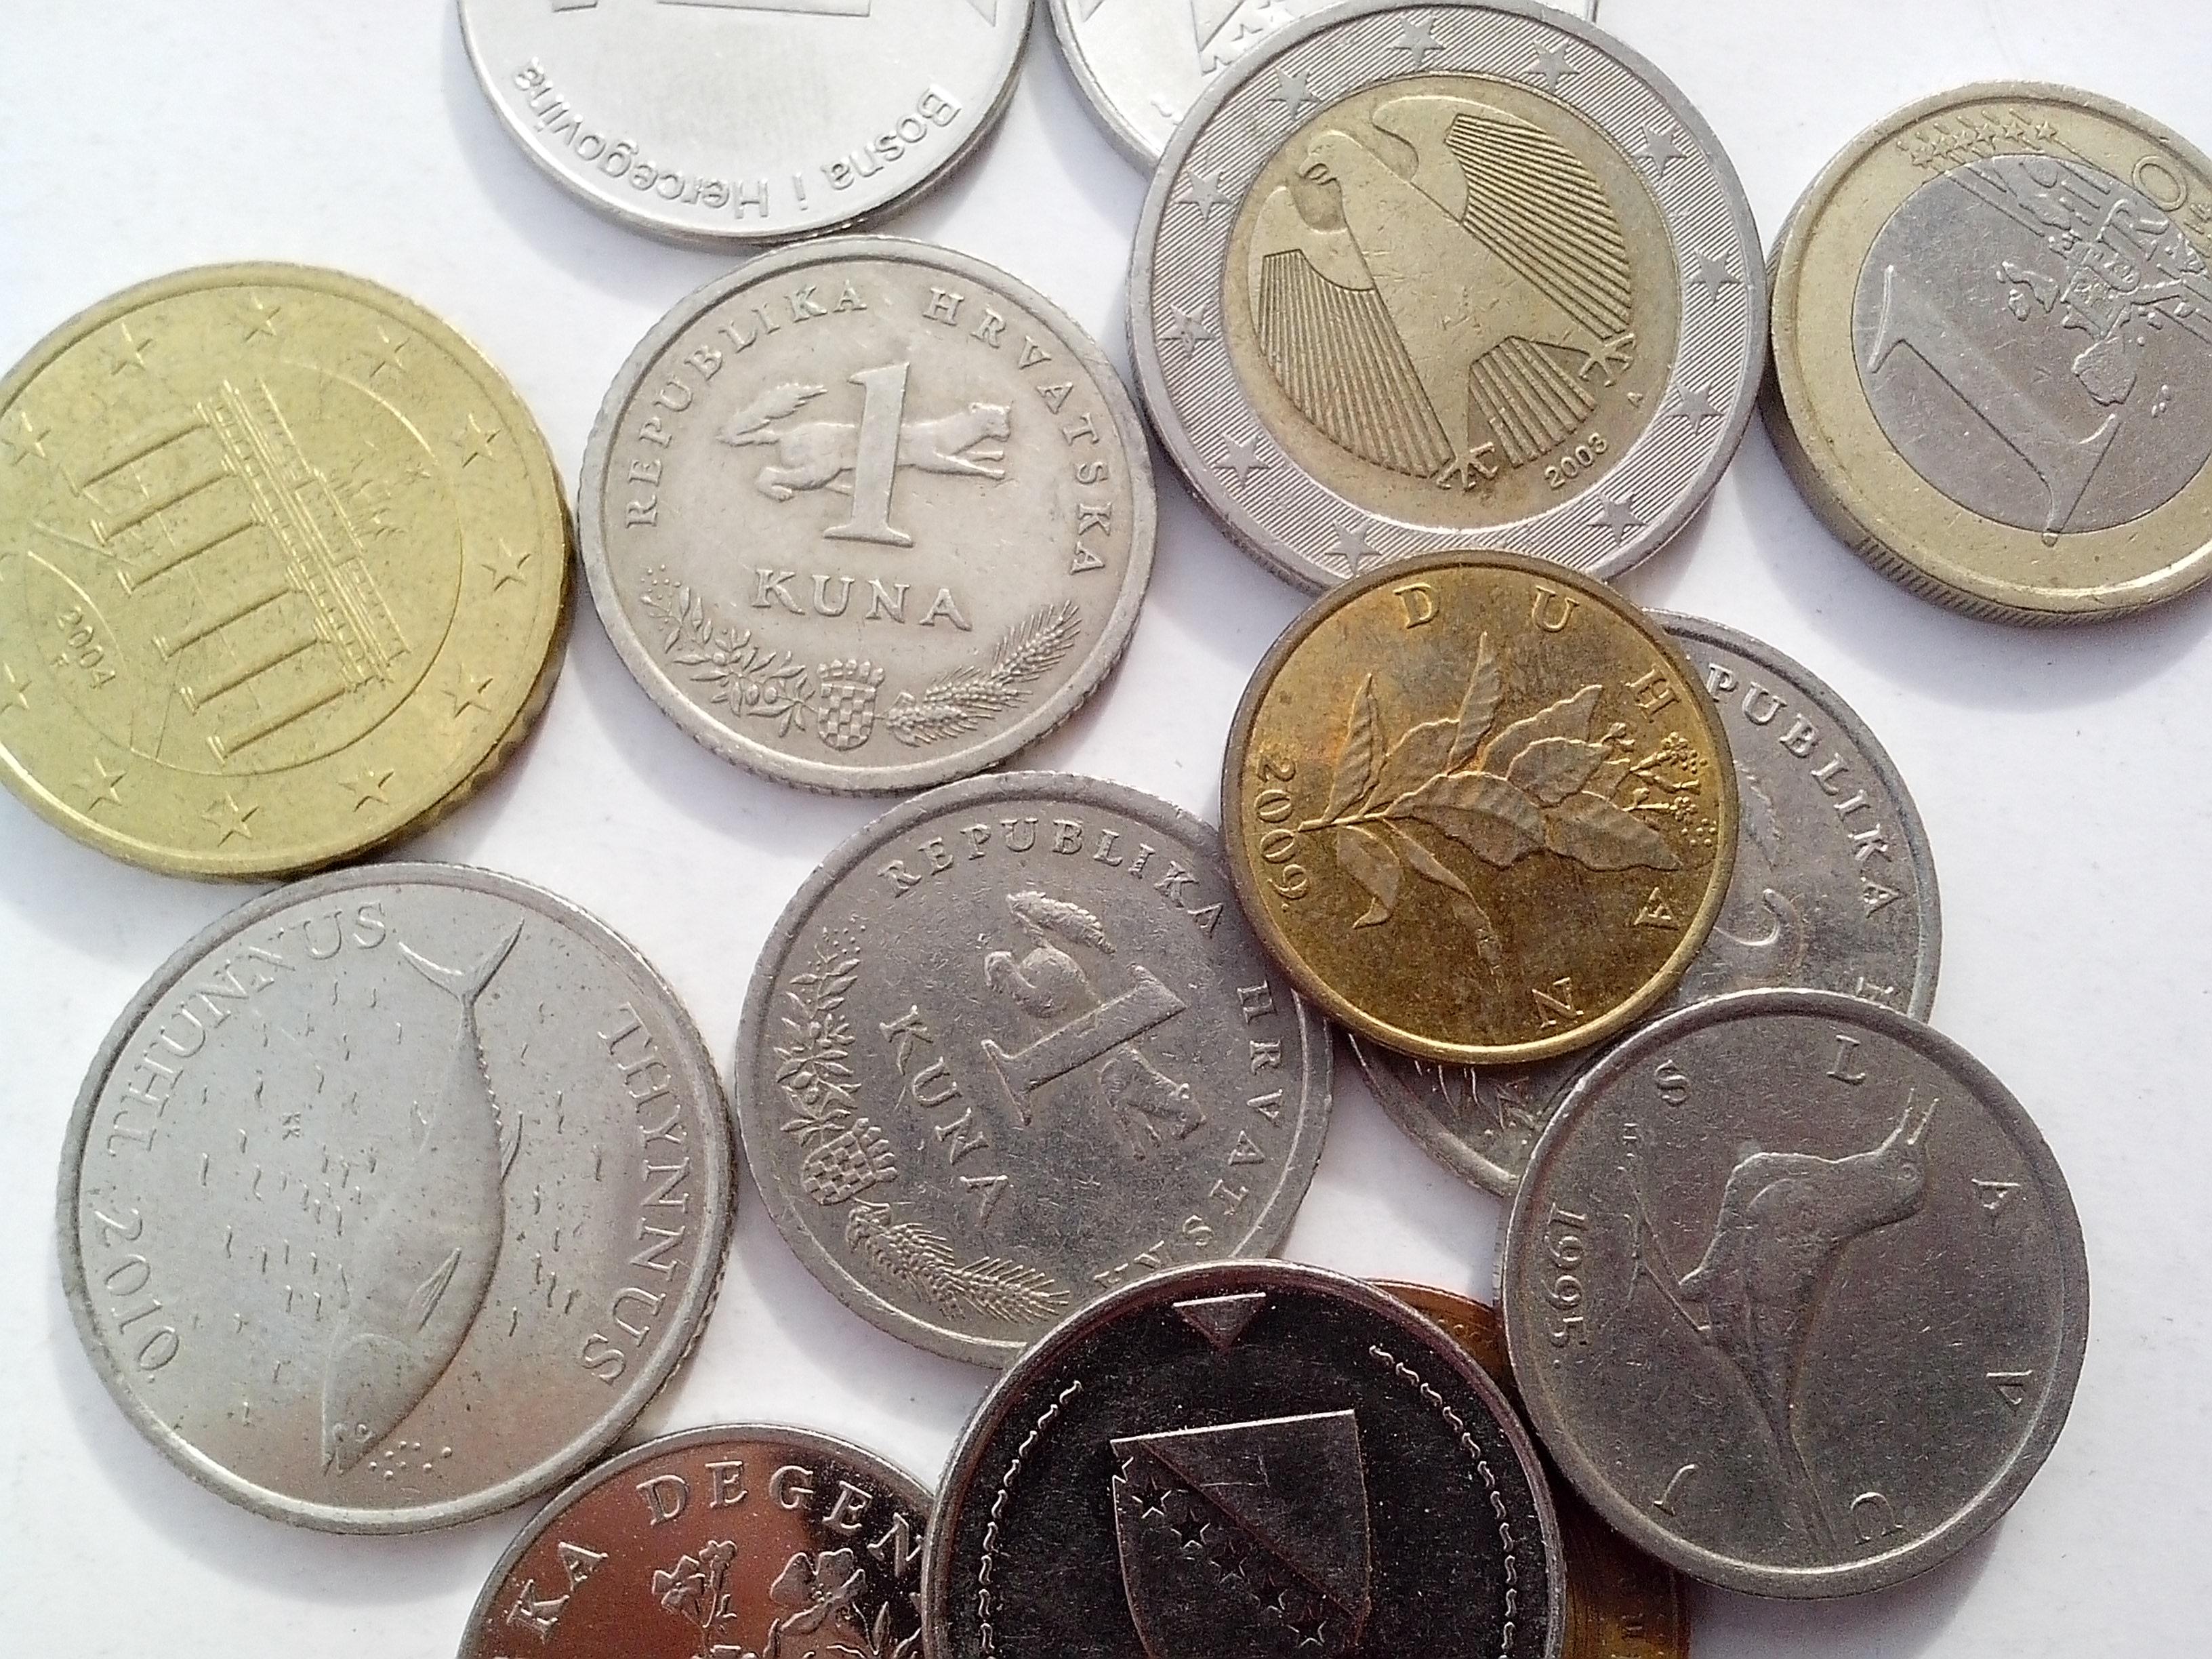 Free photograph; croatian, Bosnia, Herzegovina, coins, metal, money, cash, banknotes